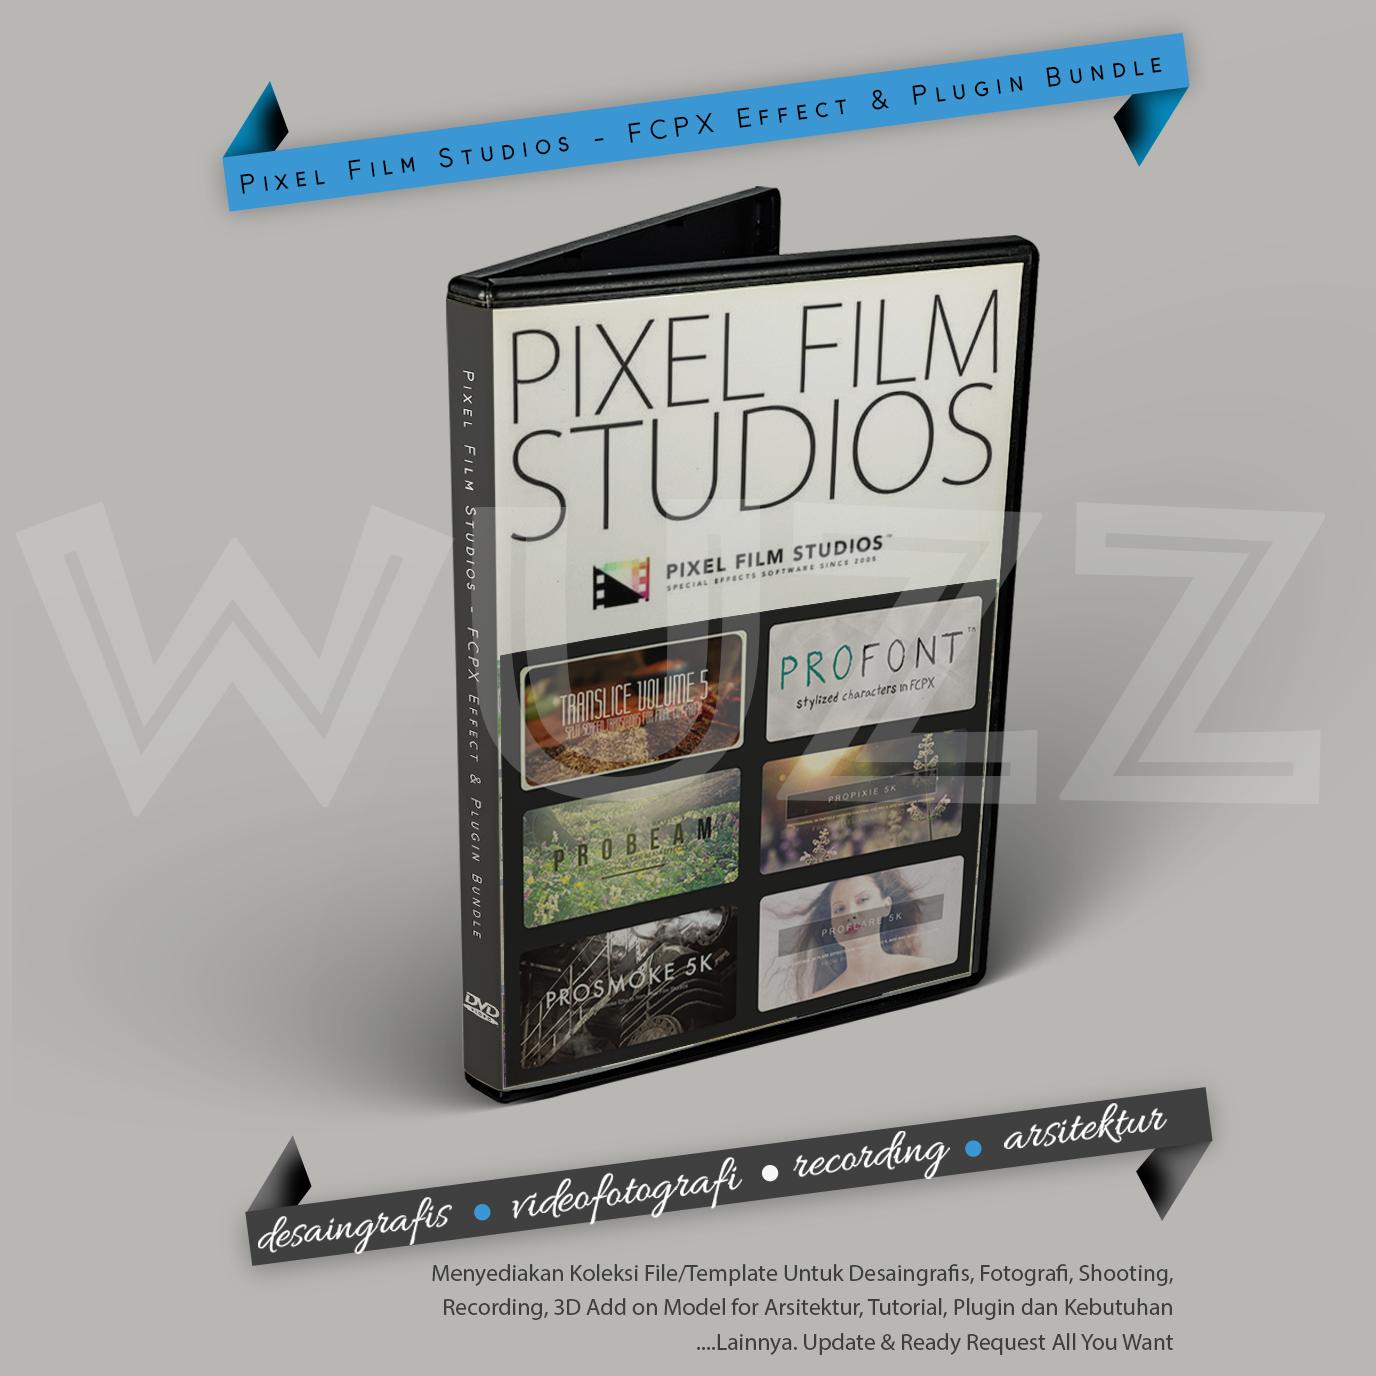 Pixel Film Studios - FCPX Effect Plugin Bundle - Pin. 57D07DEB   WA ...